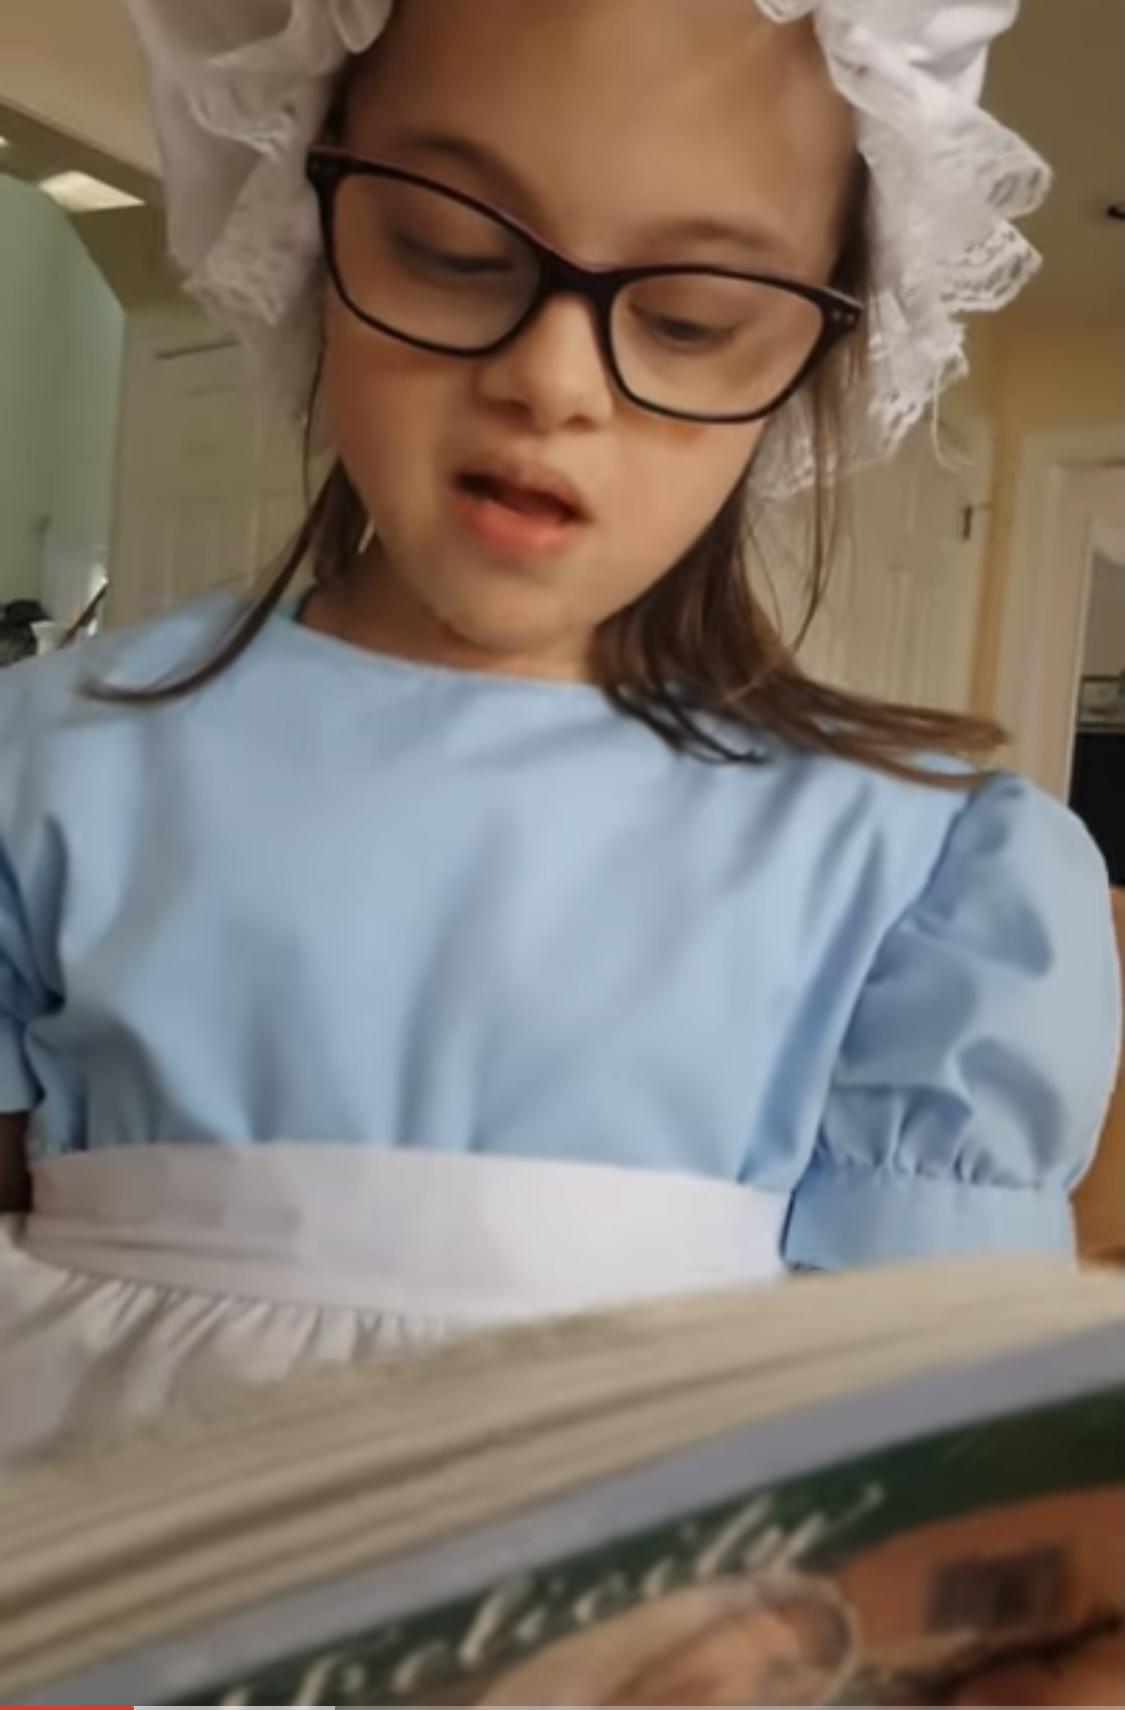 Elsie reads from Felicity https://youtu.be/z8WxRuxGtO4